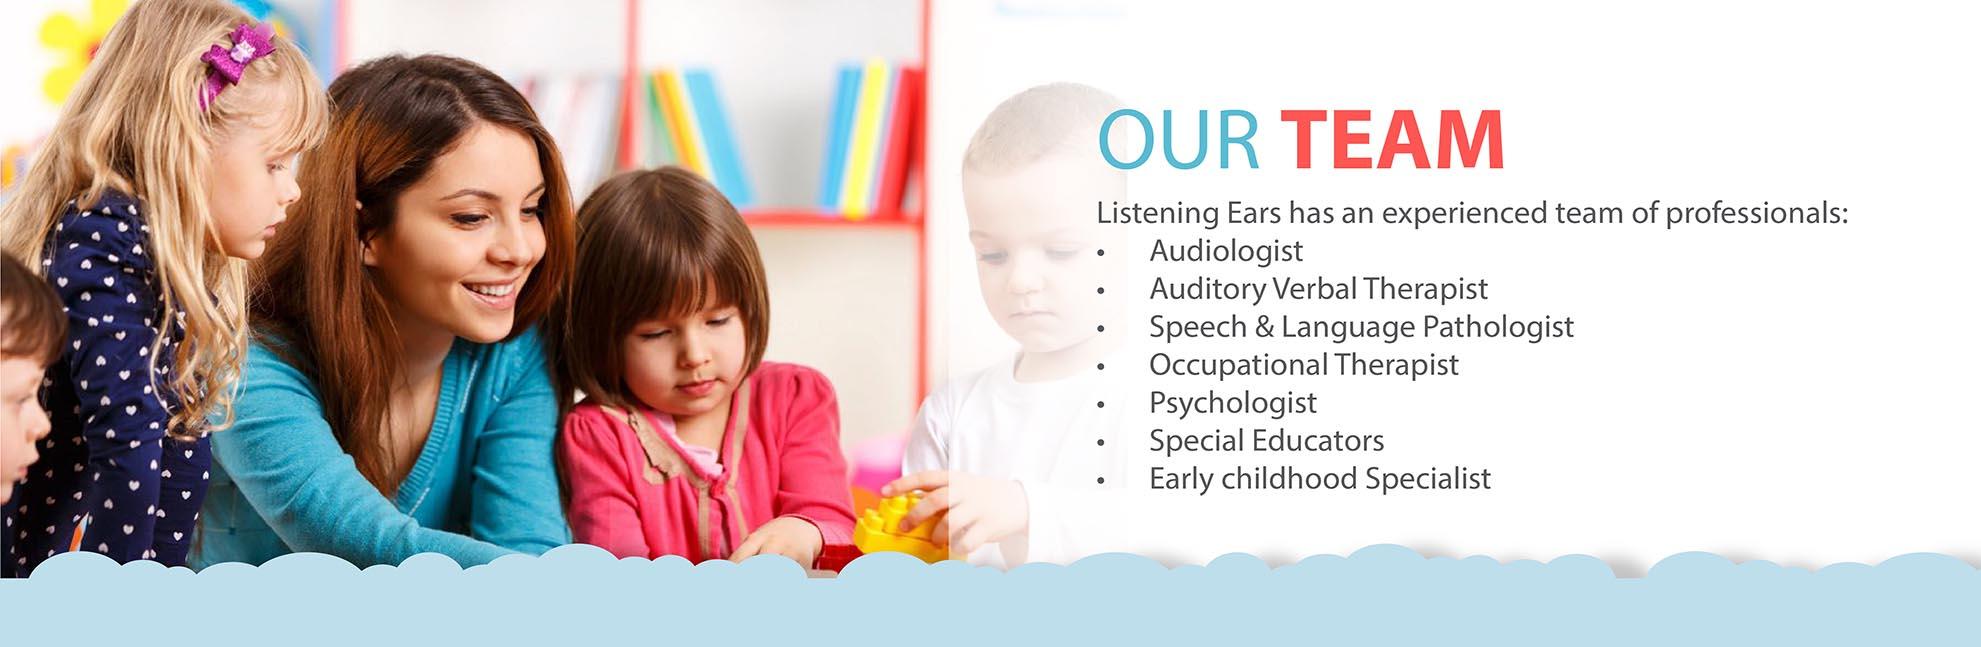 Listening Ears Team